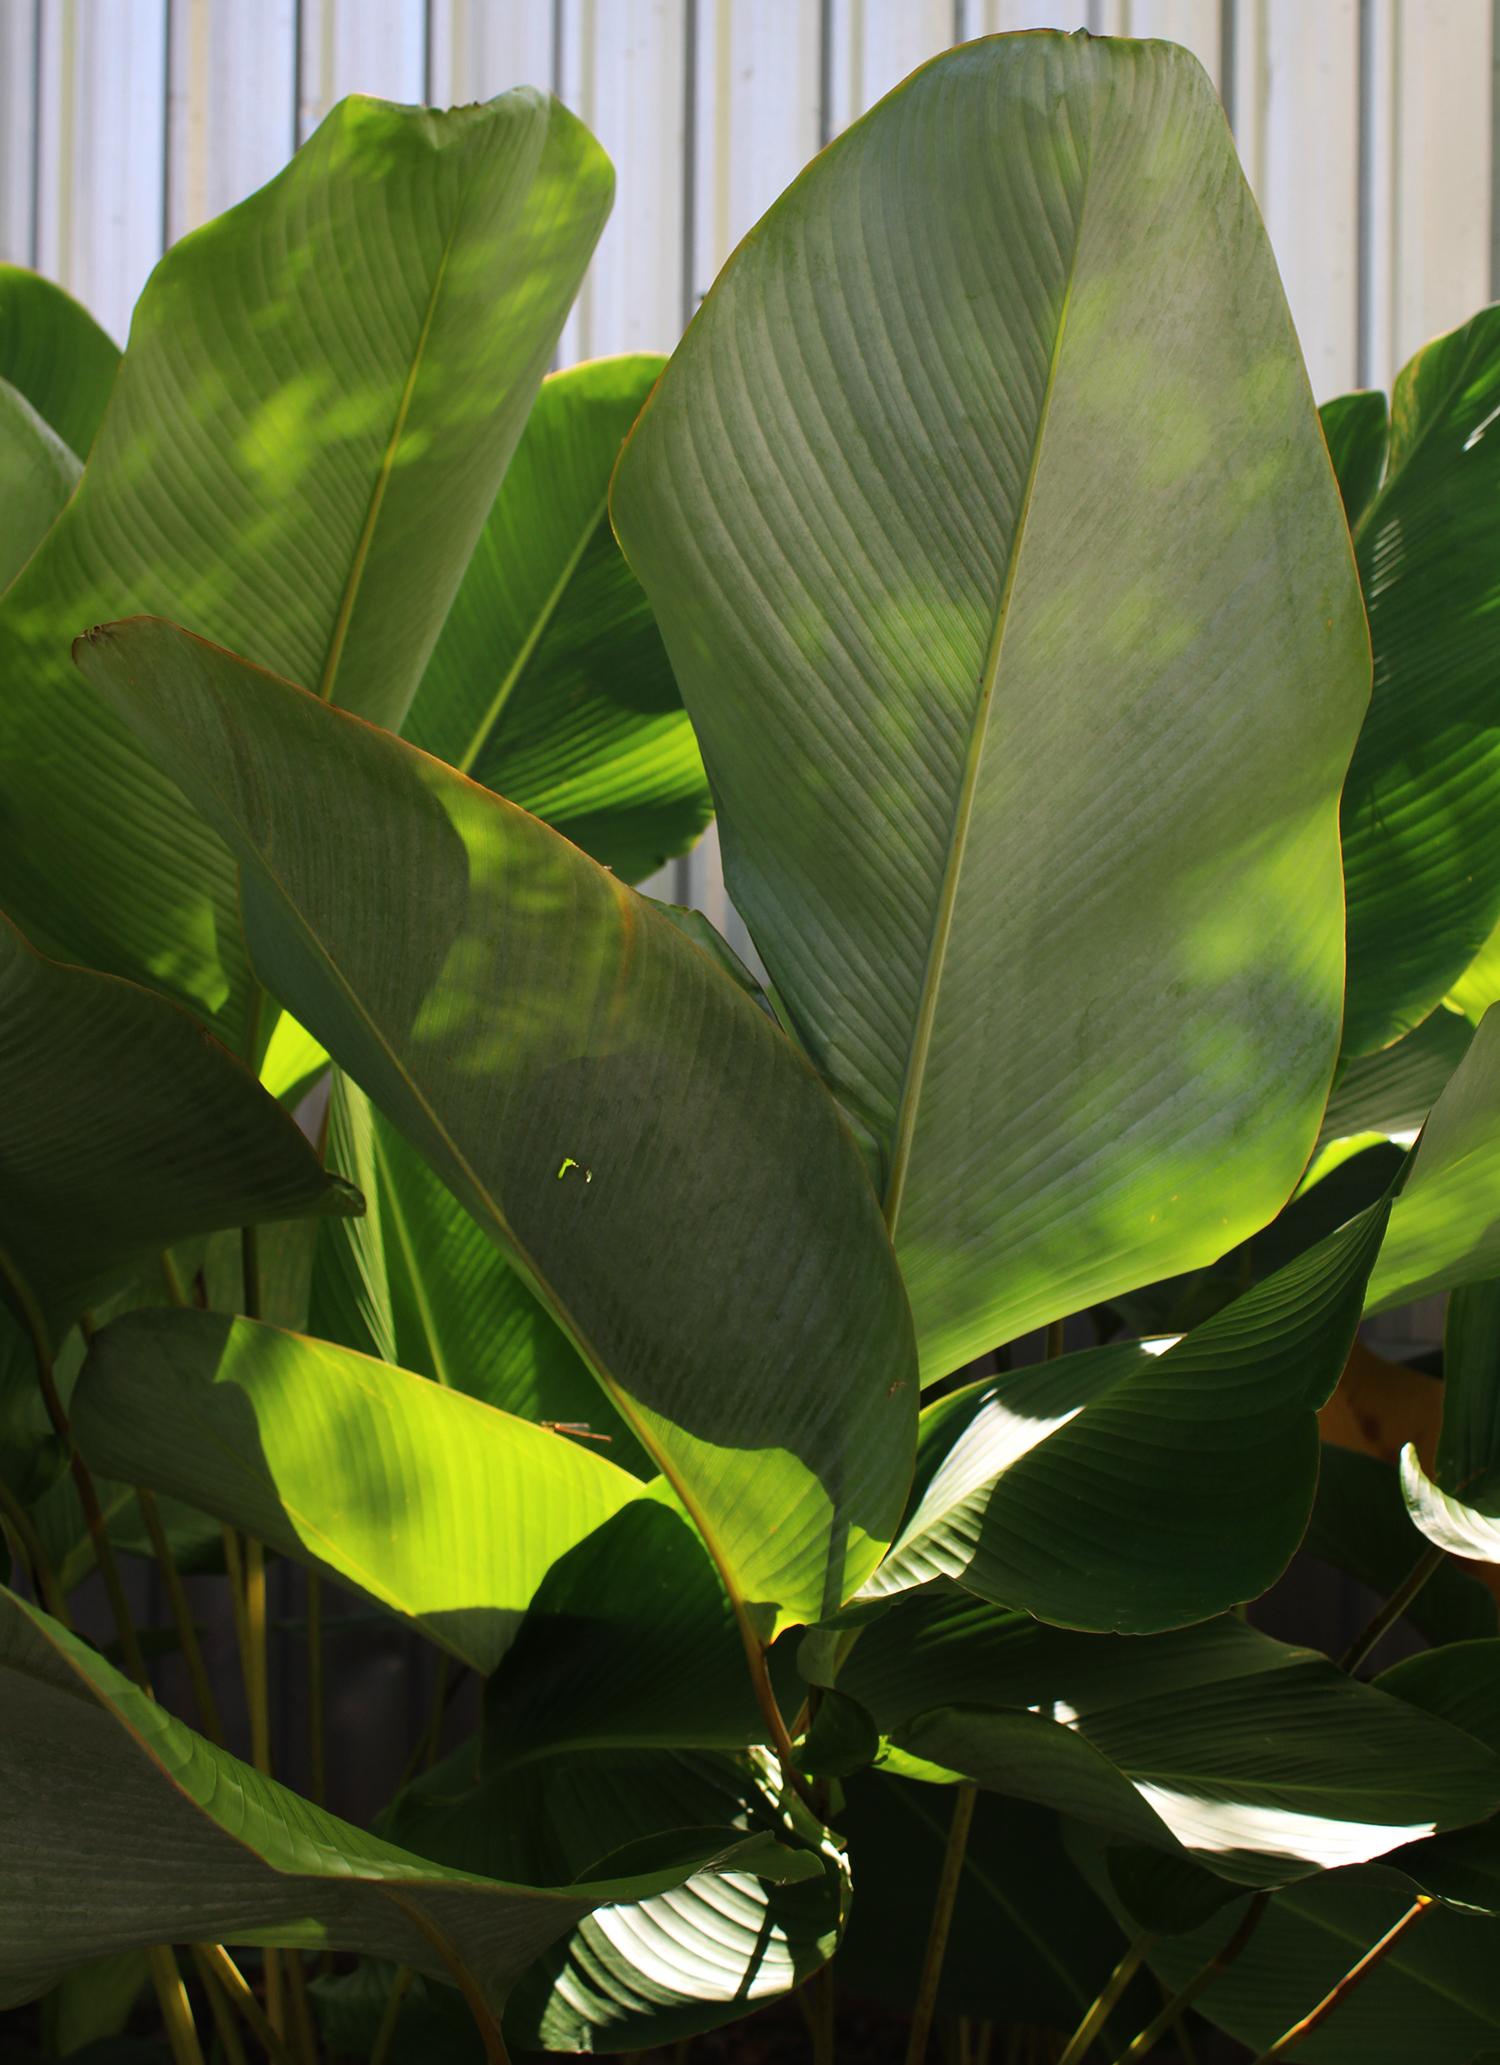 wearemad palm tree phuket.jpg